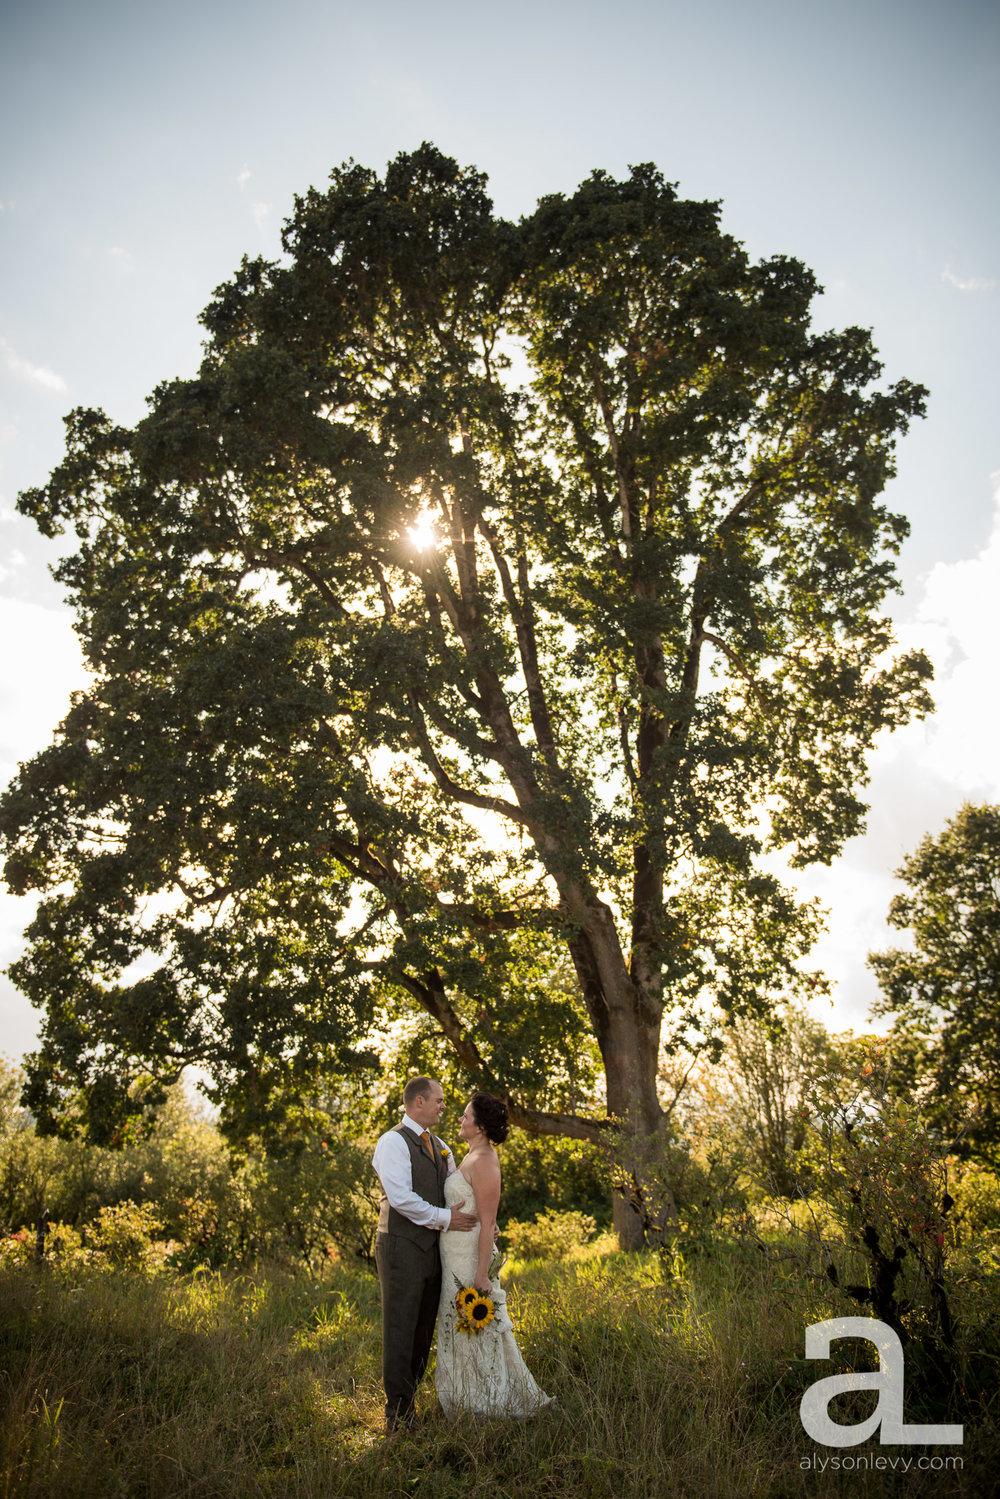 Krugers-Farm-Sauvie-Island-Wedding-Photography-014.jpg